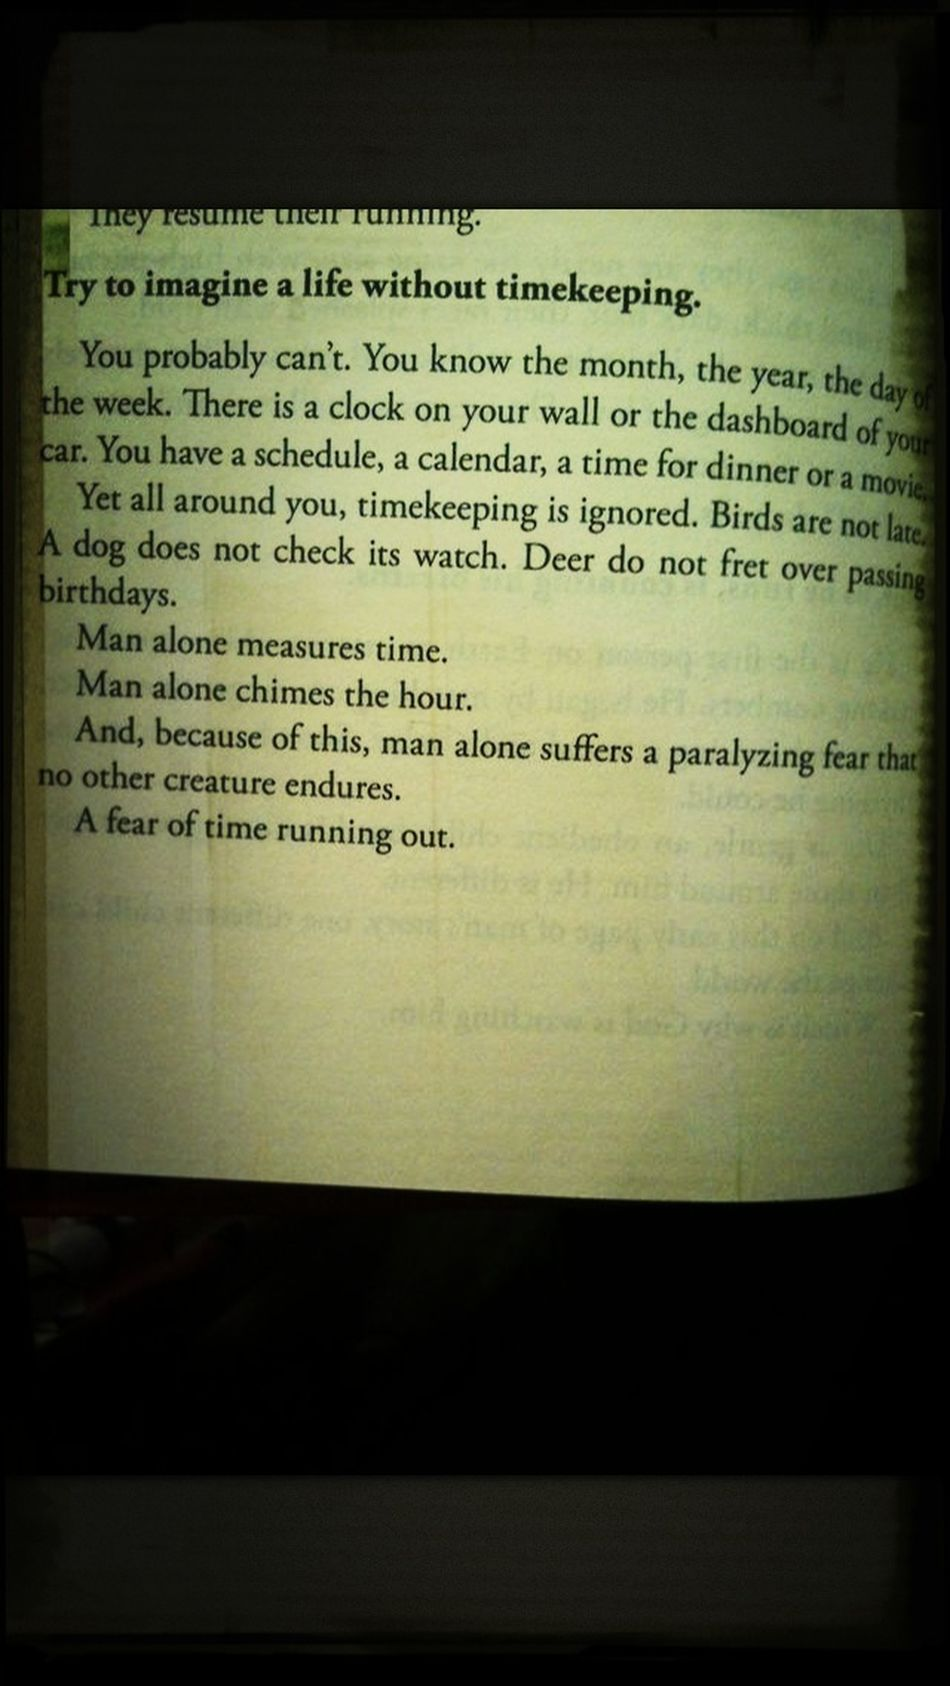 #man #time #runningout